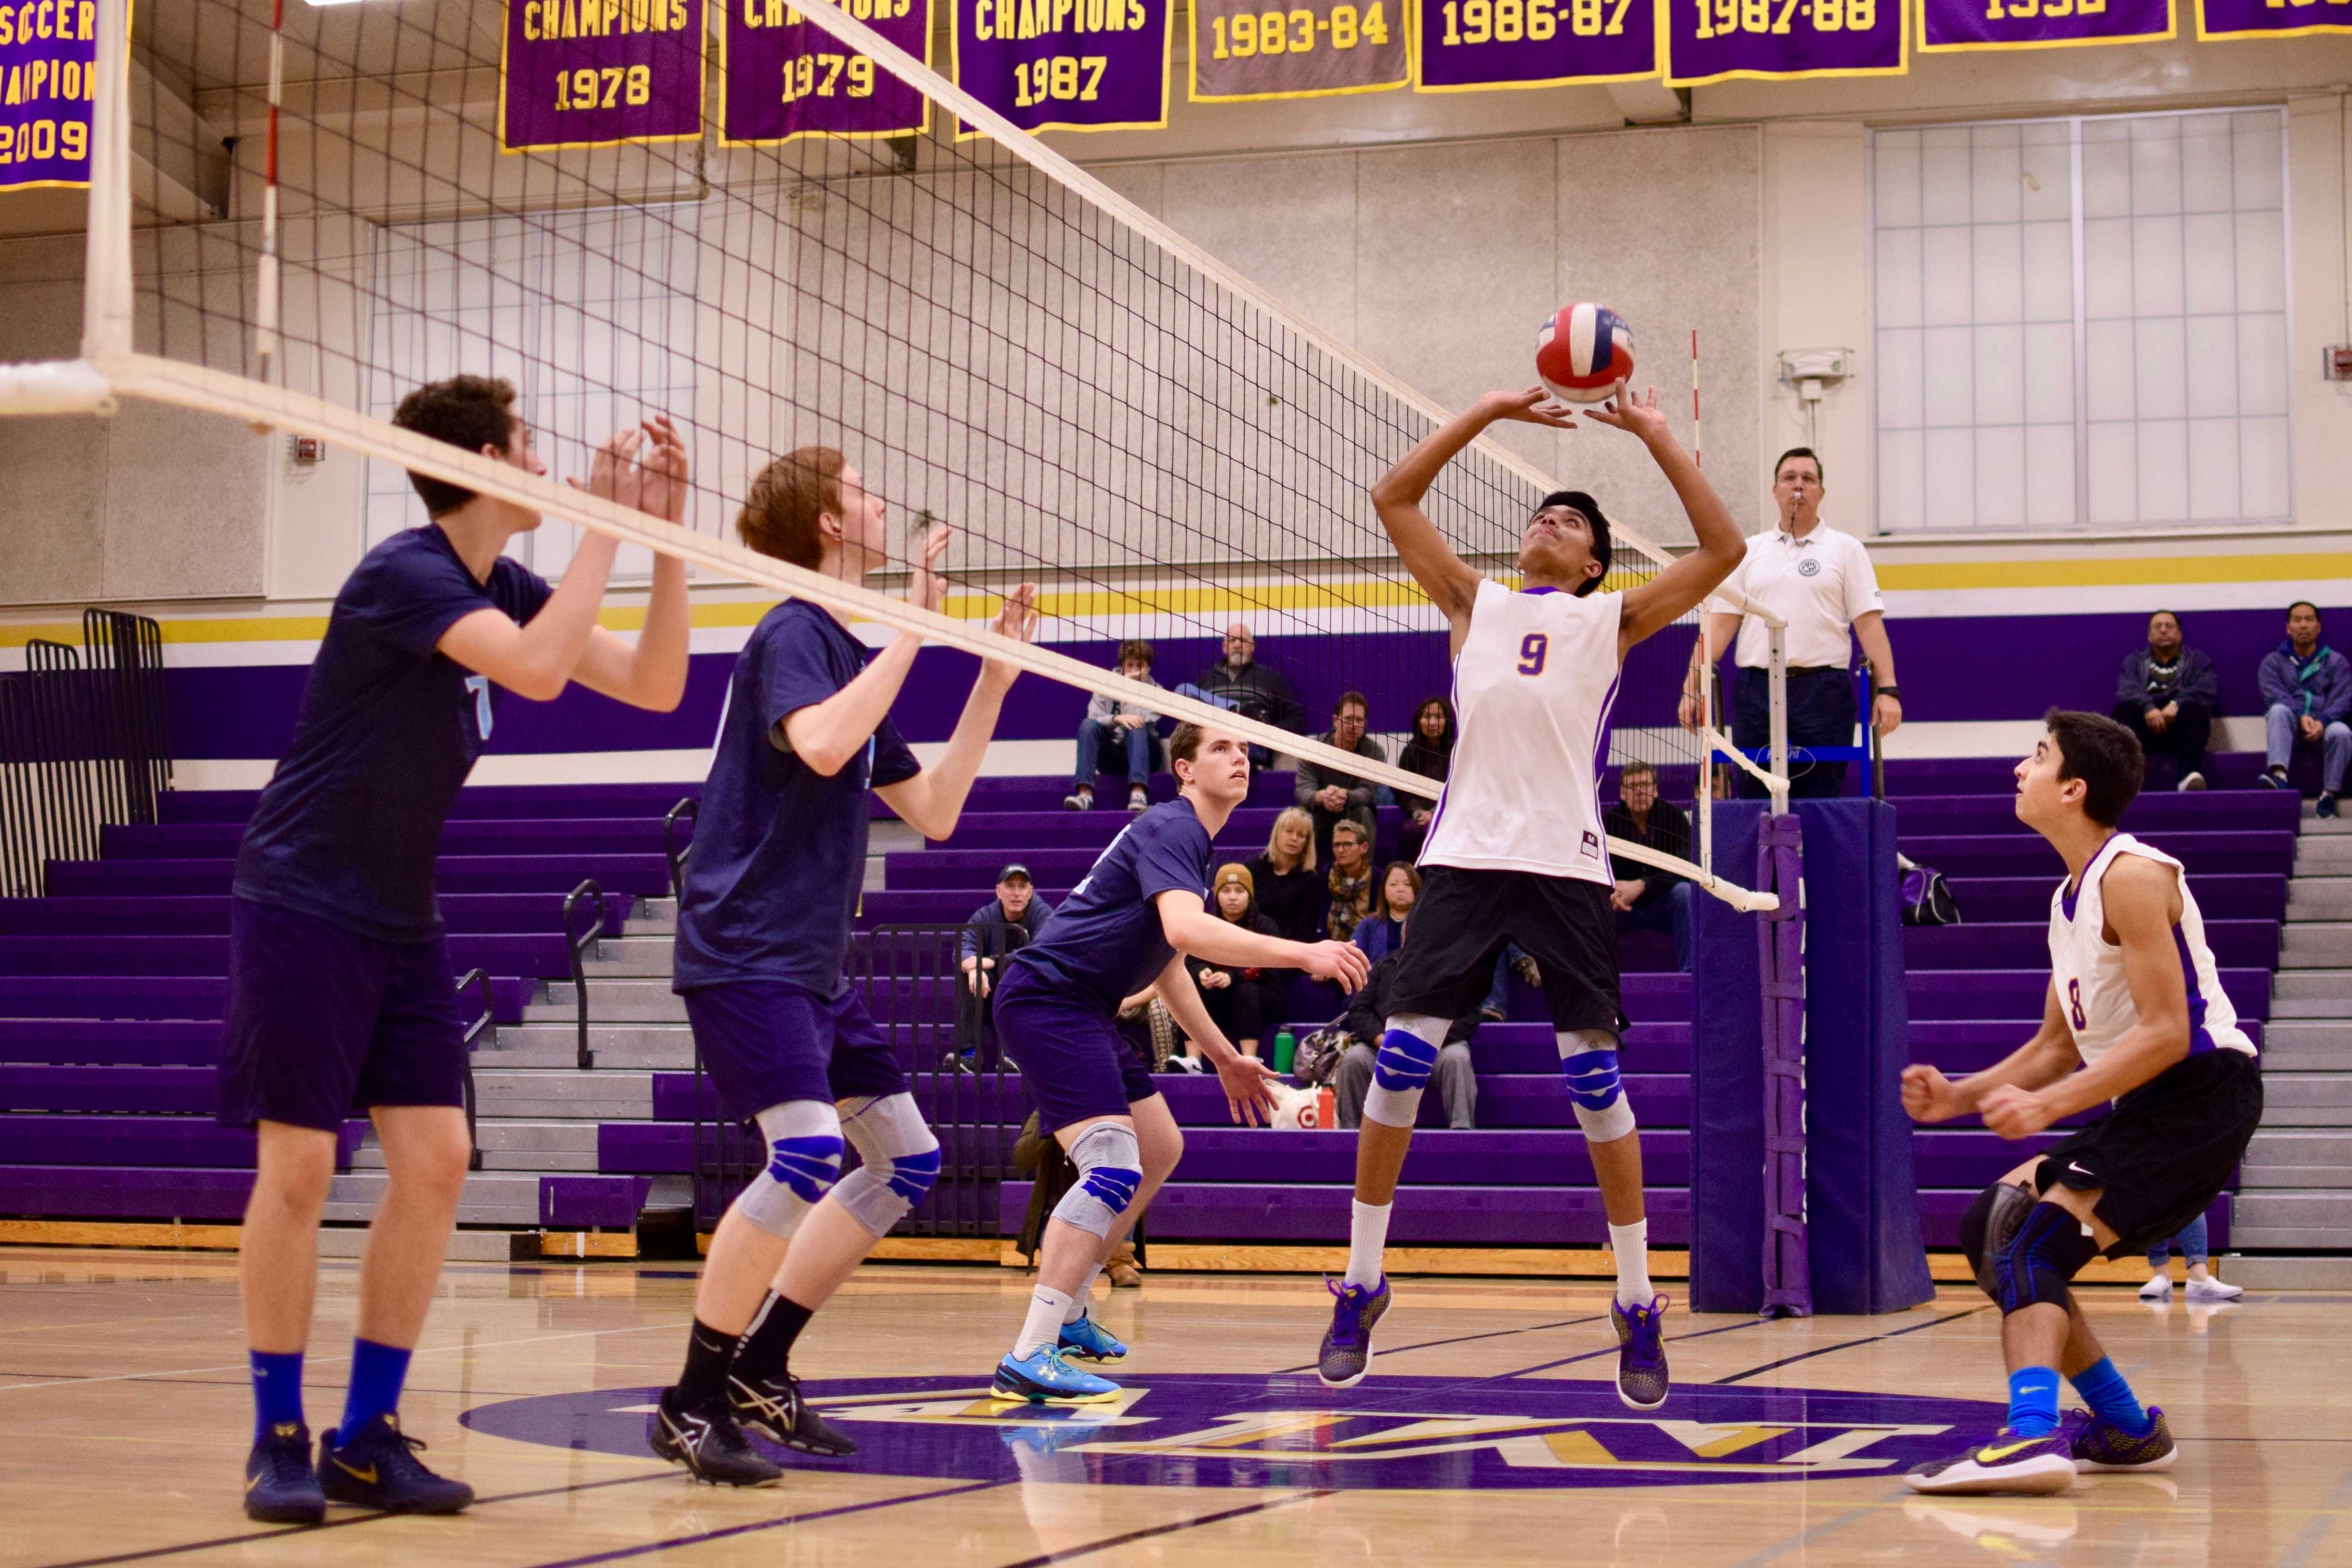 Boys volleyball: Team gets revenge against Bellarmine College Preparatory in season's home opener